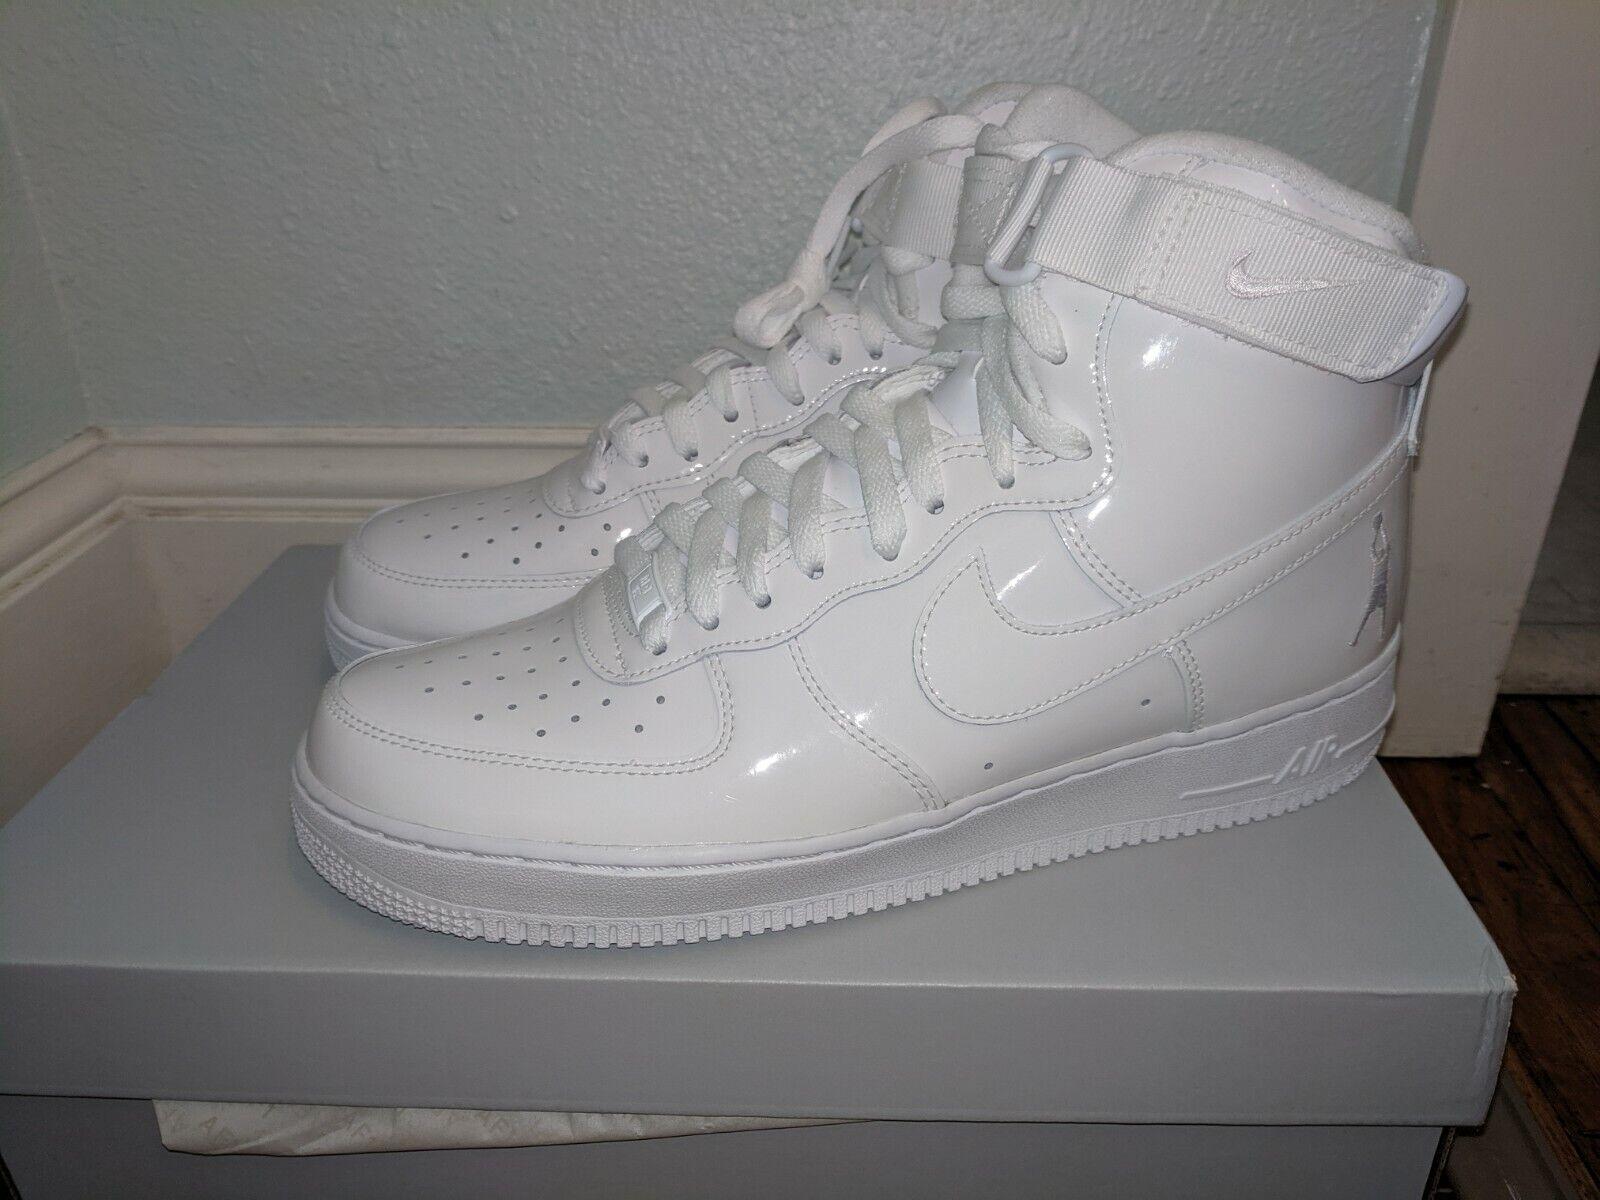 Nike Air Force 1 I hi Reno QS sheed triple blanco Patent 10.5